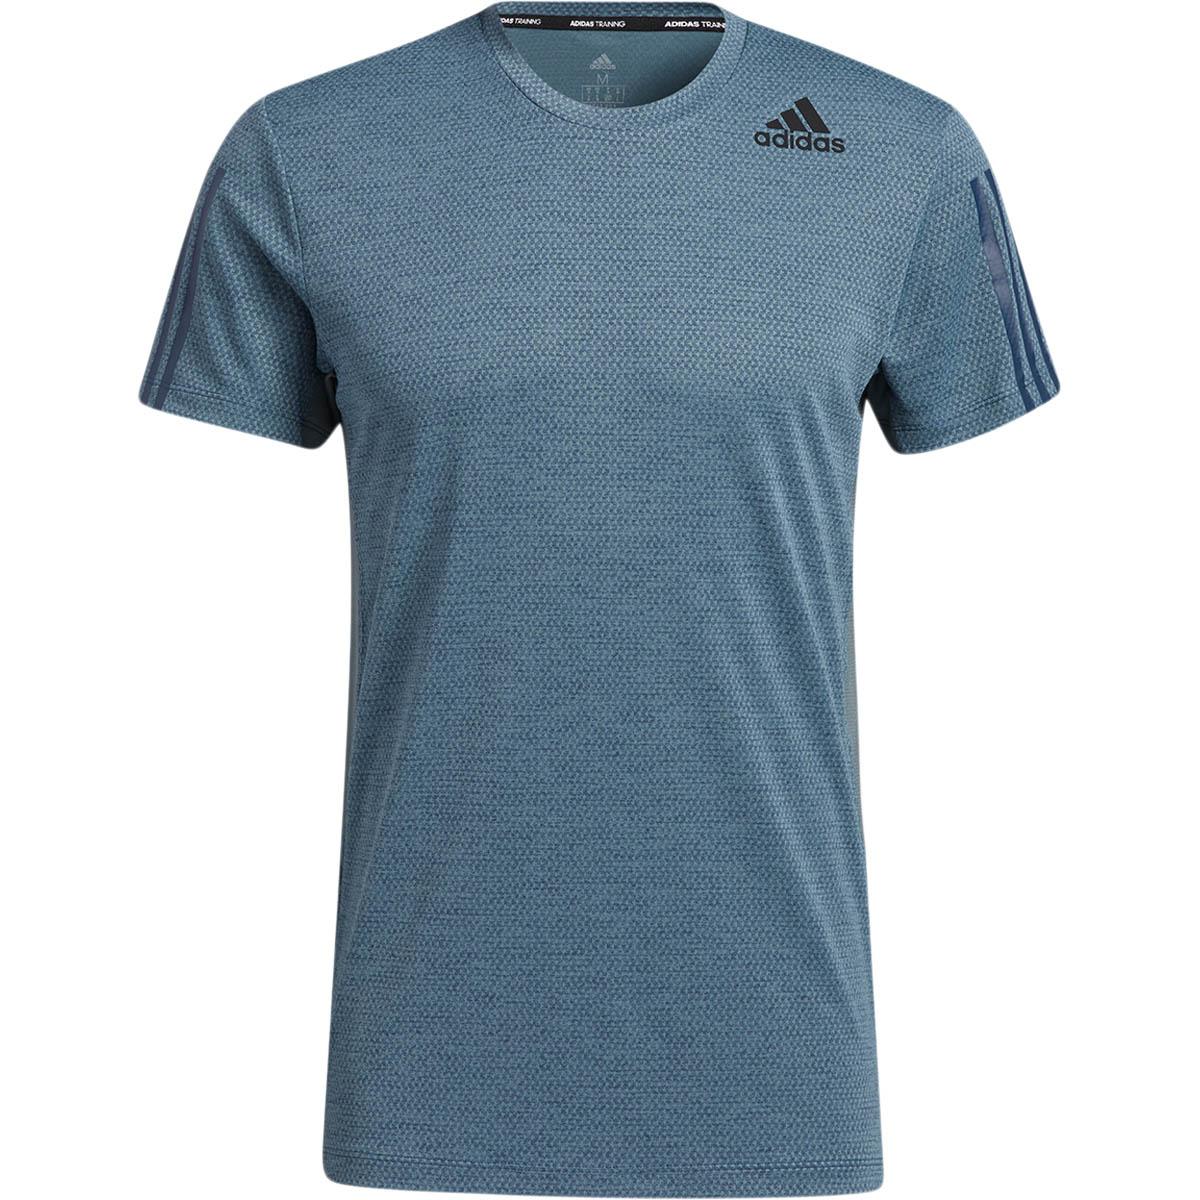 adidas Heat Ready 3-Stripes Trænings T-shirt Herre